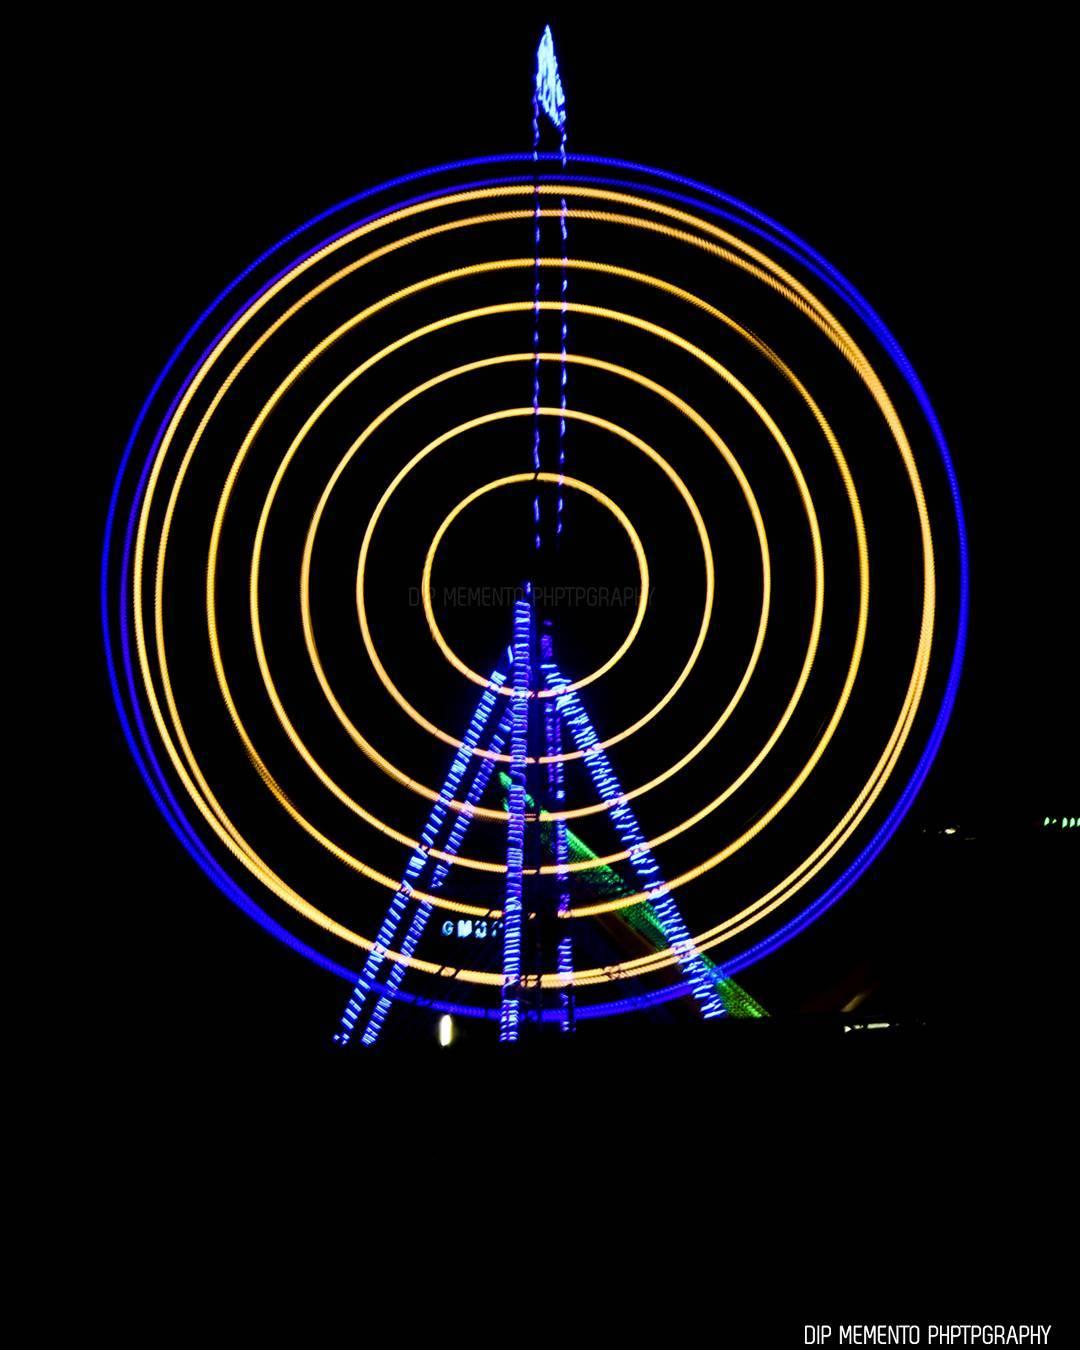 Long Exposure Ferries Wheel ..... #longexposure #ferrieswheel #photography #photoholic #photographers_of_india #amdavad #ahmedabad #ahmedabadphotography #lightpainting #light #thoughts #canon #nikon #photooftheday #travel #art  #picoftheday #beautiful #instagram #instagood #photos  #photograph#picture  #summer #pic  #love #indiaclicks  #foto4everofficial #like4like #likeforlike